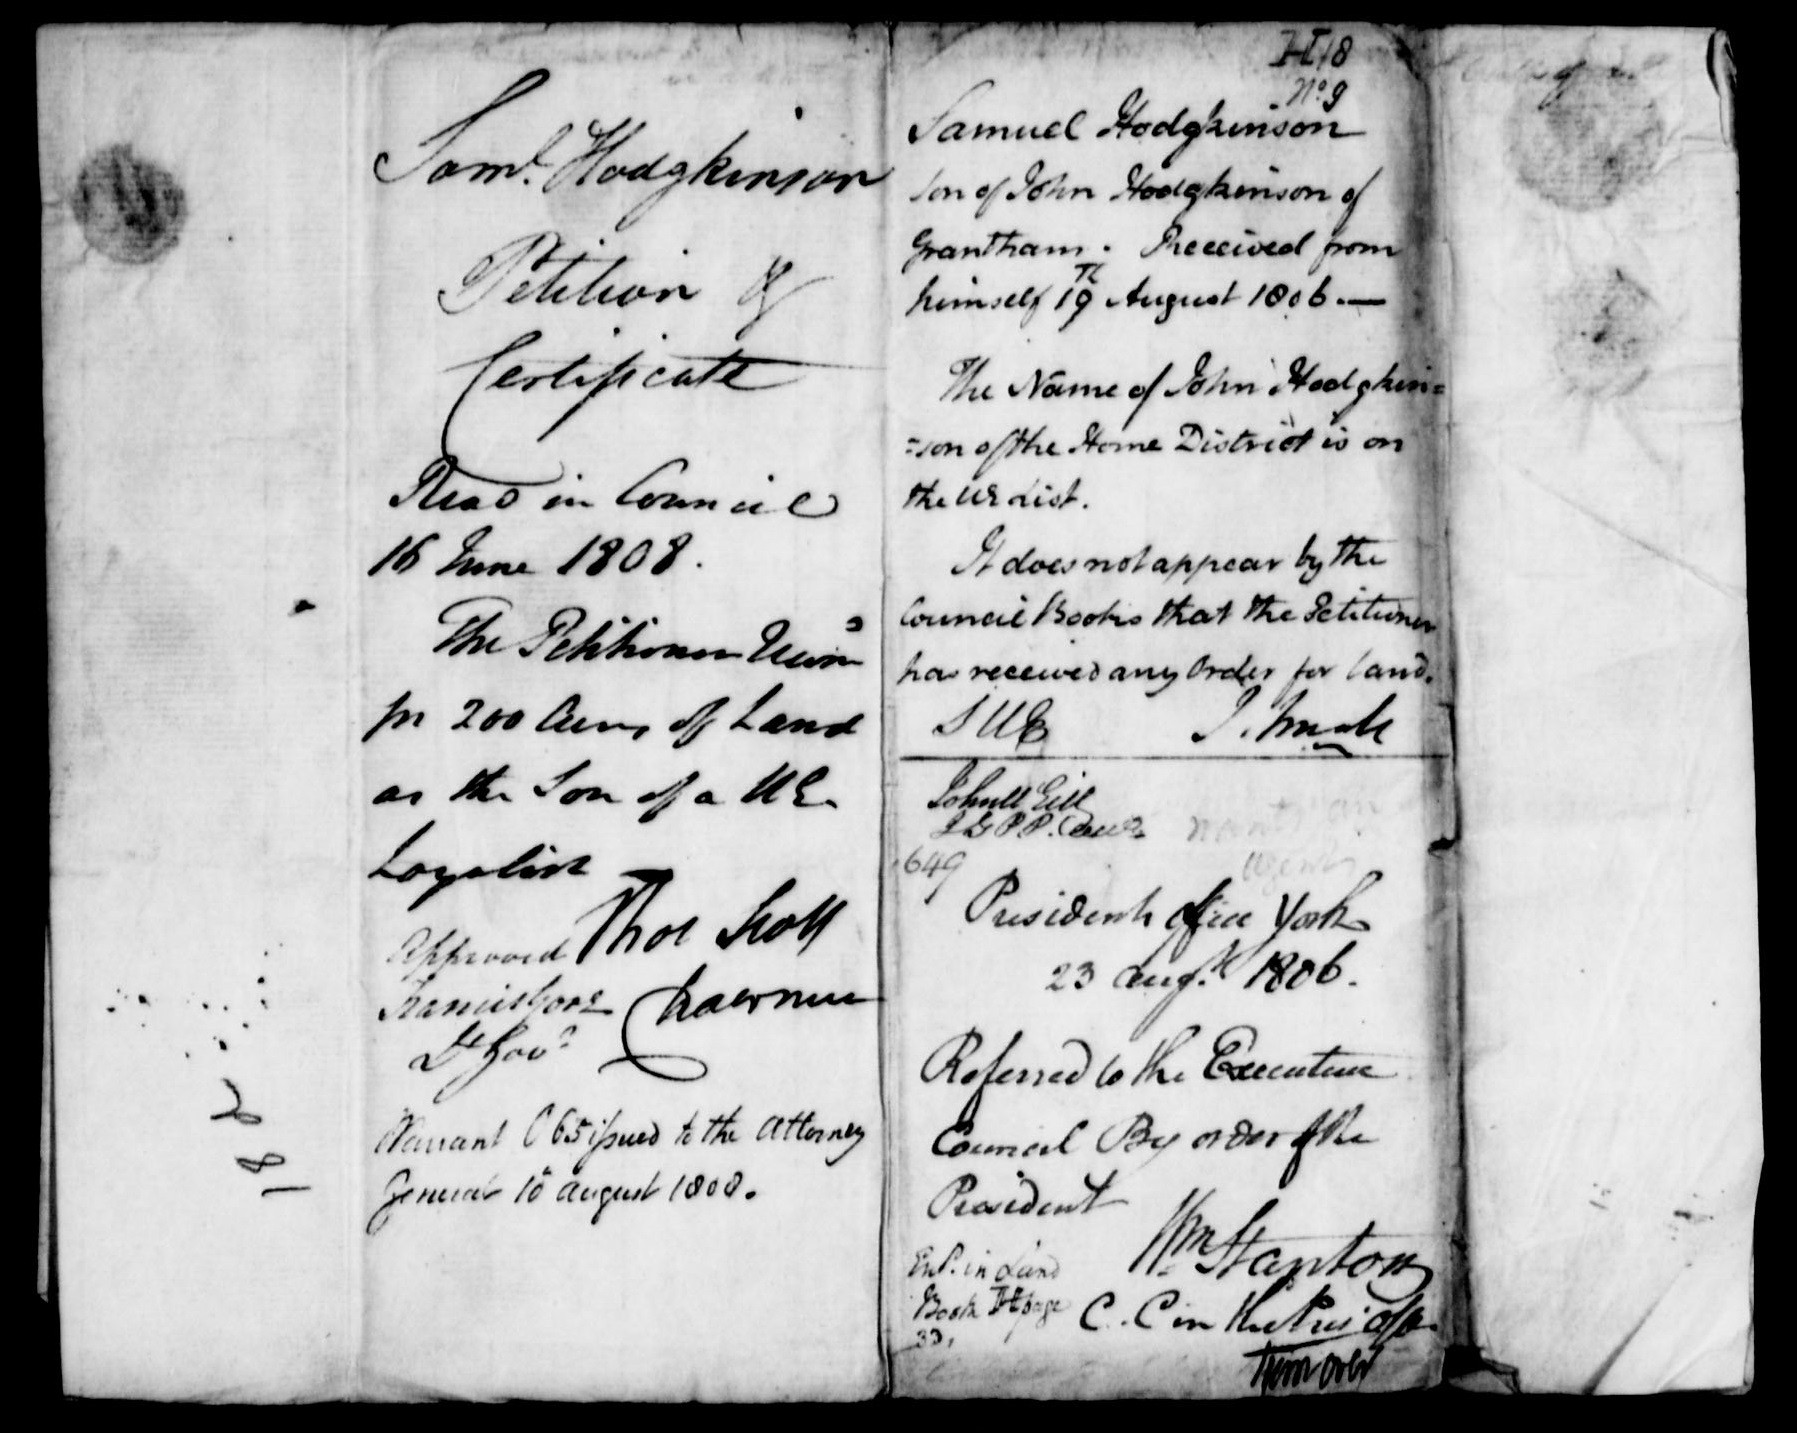 Samuel Hodgkinon Land Petition page 5